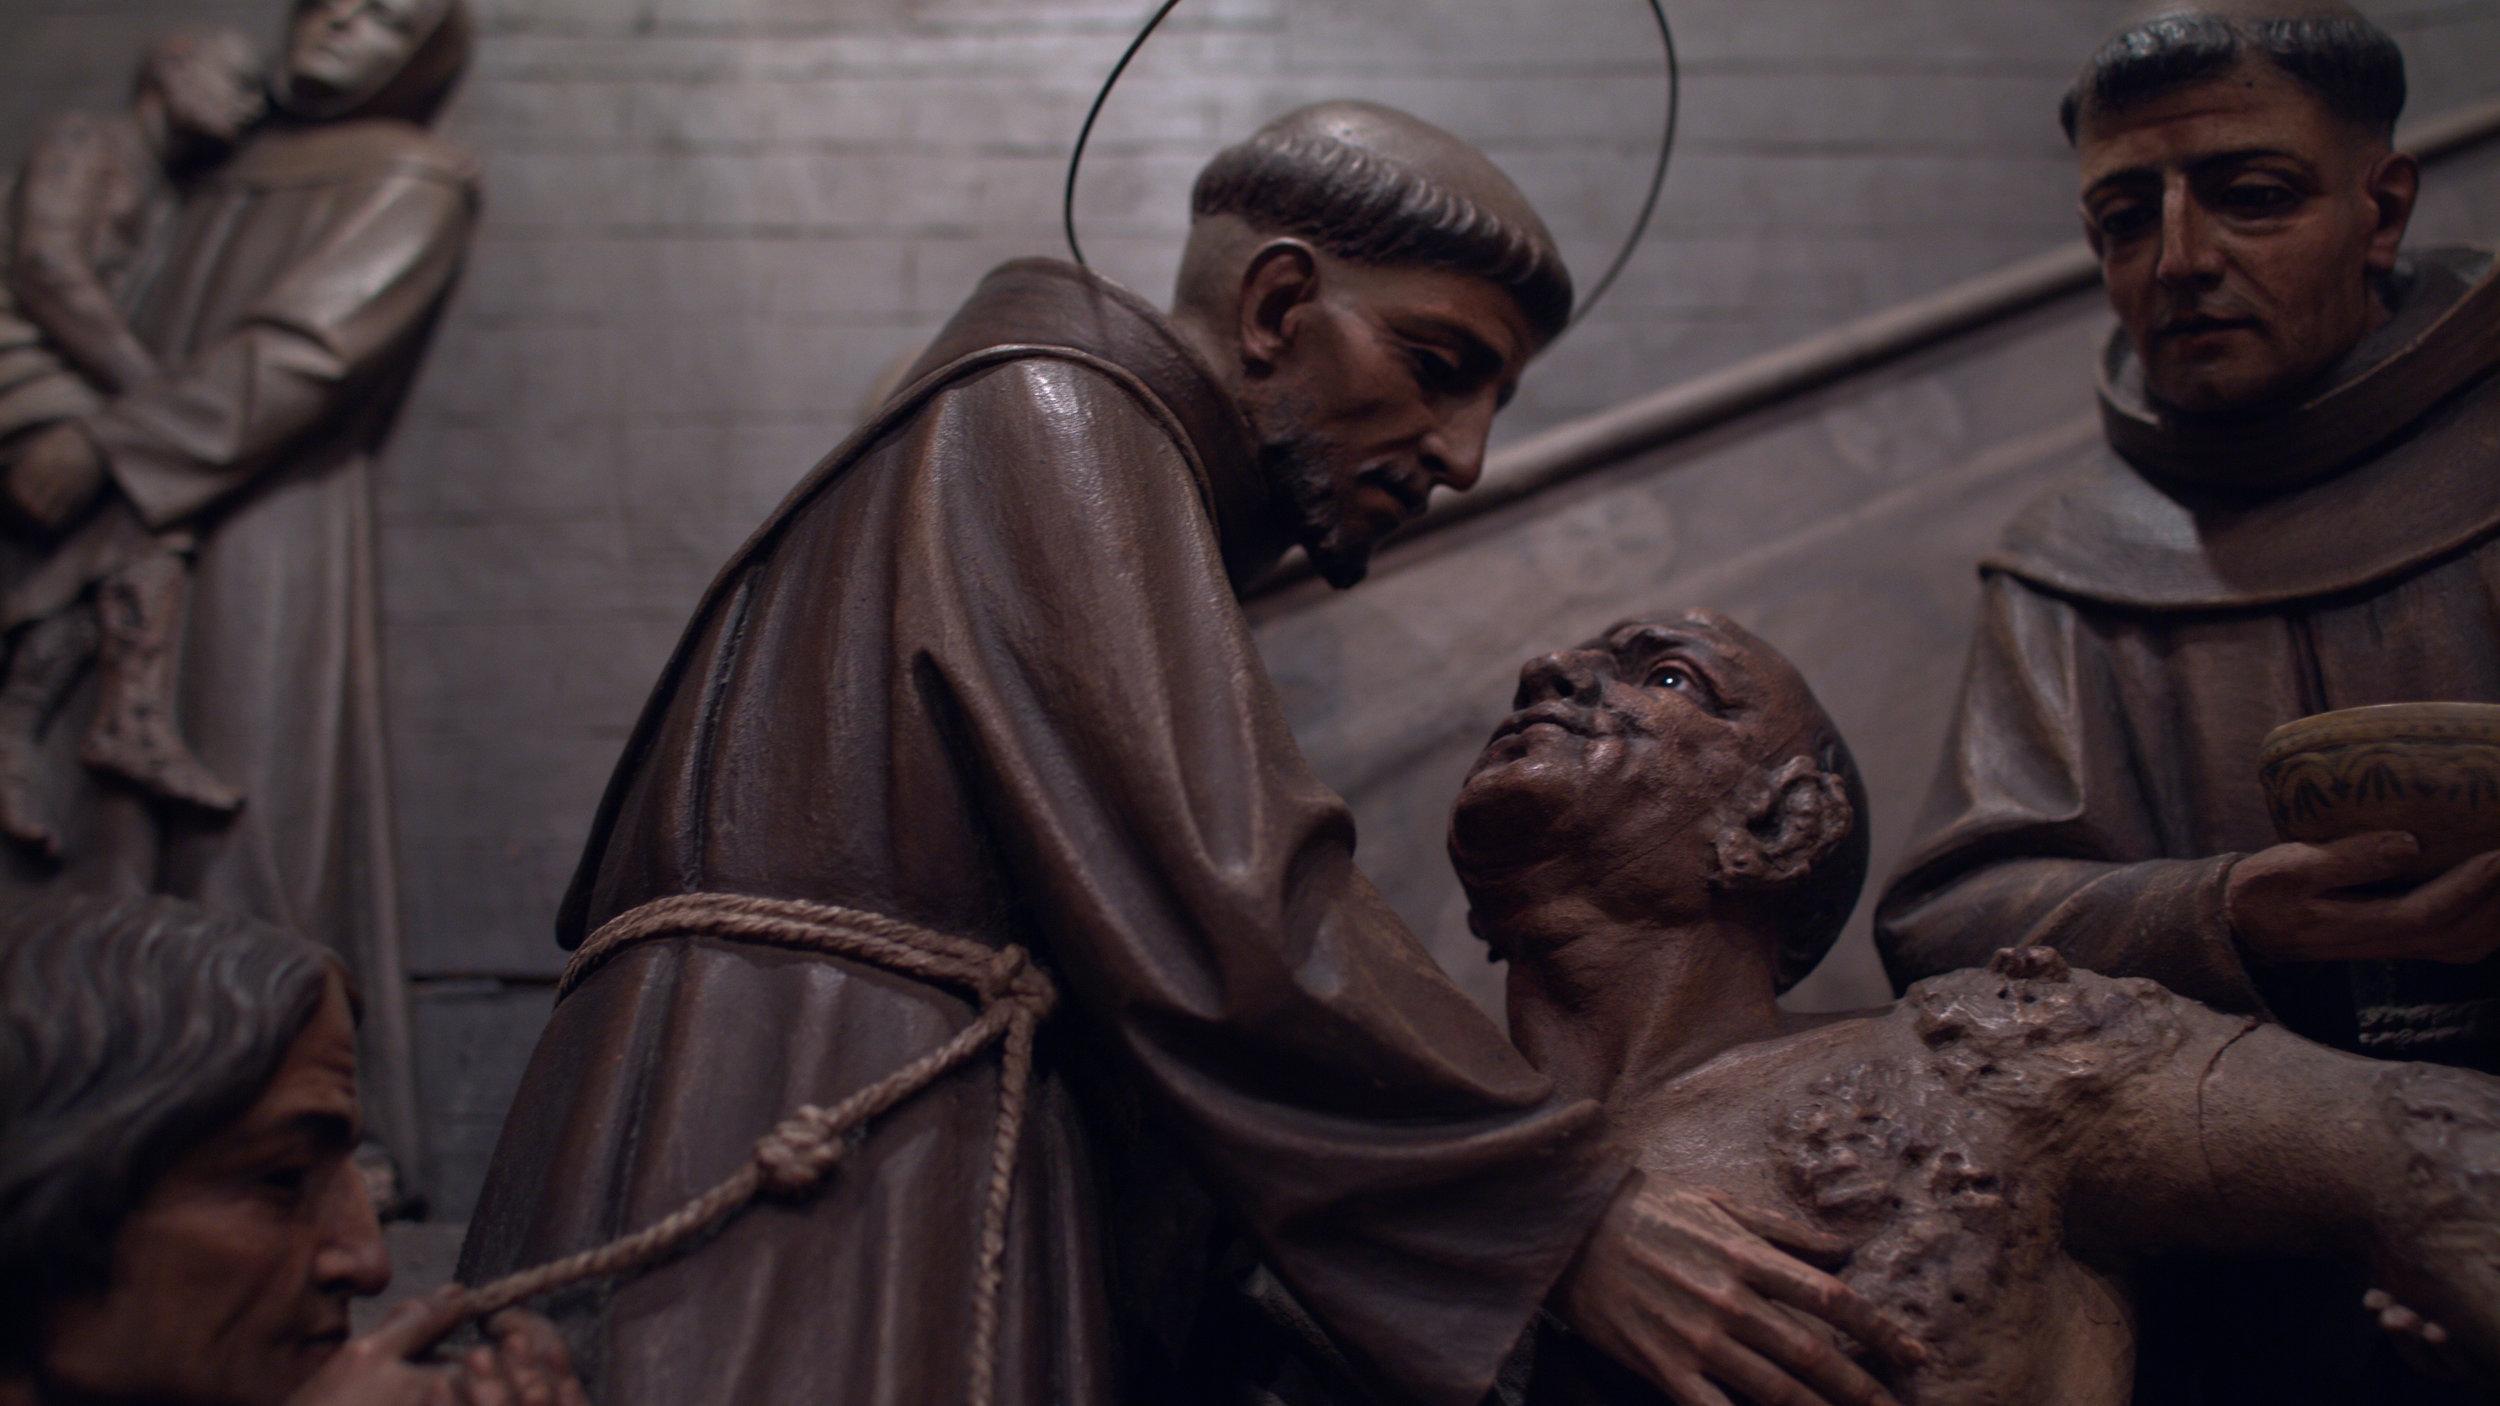 Francis and the Leper - A020_01011222_C065.mov.12_22_53_13.Still001.jpg